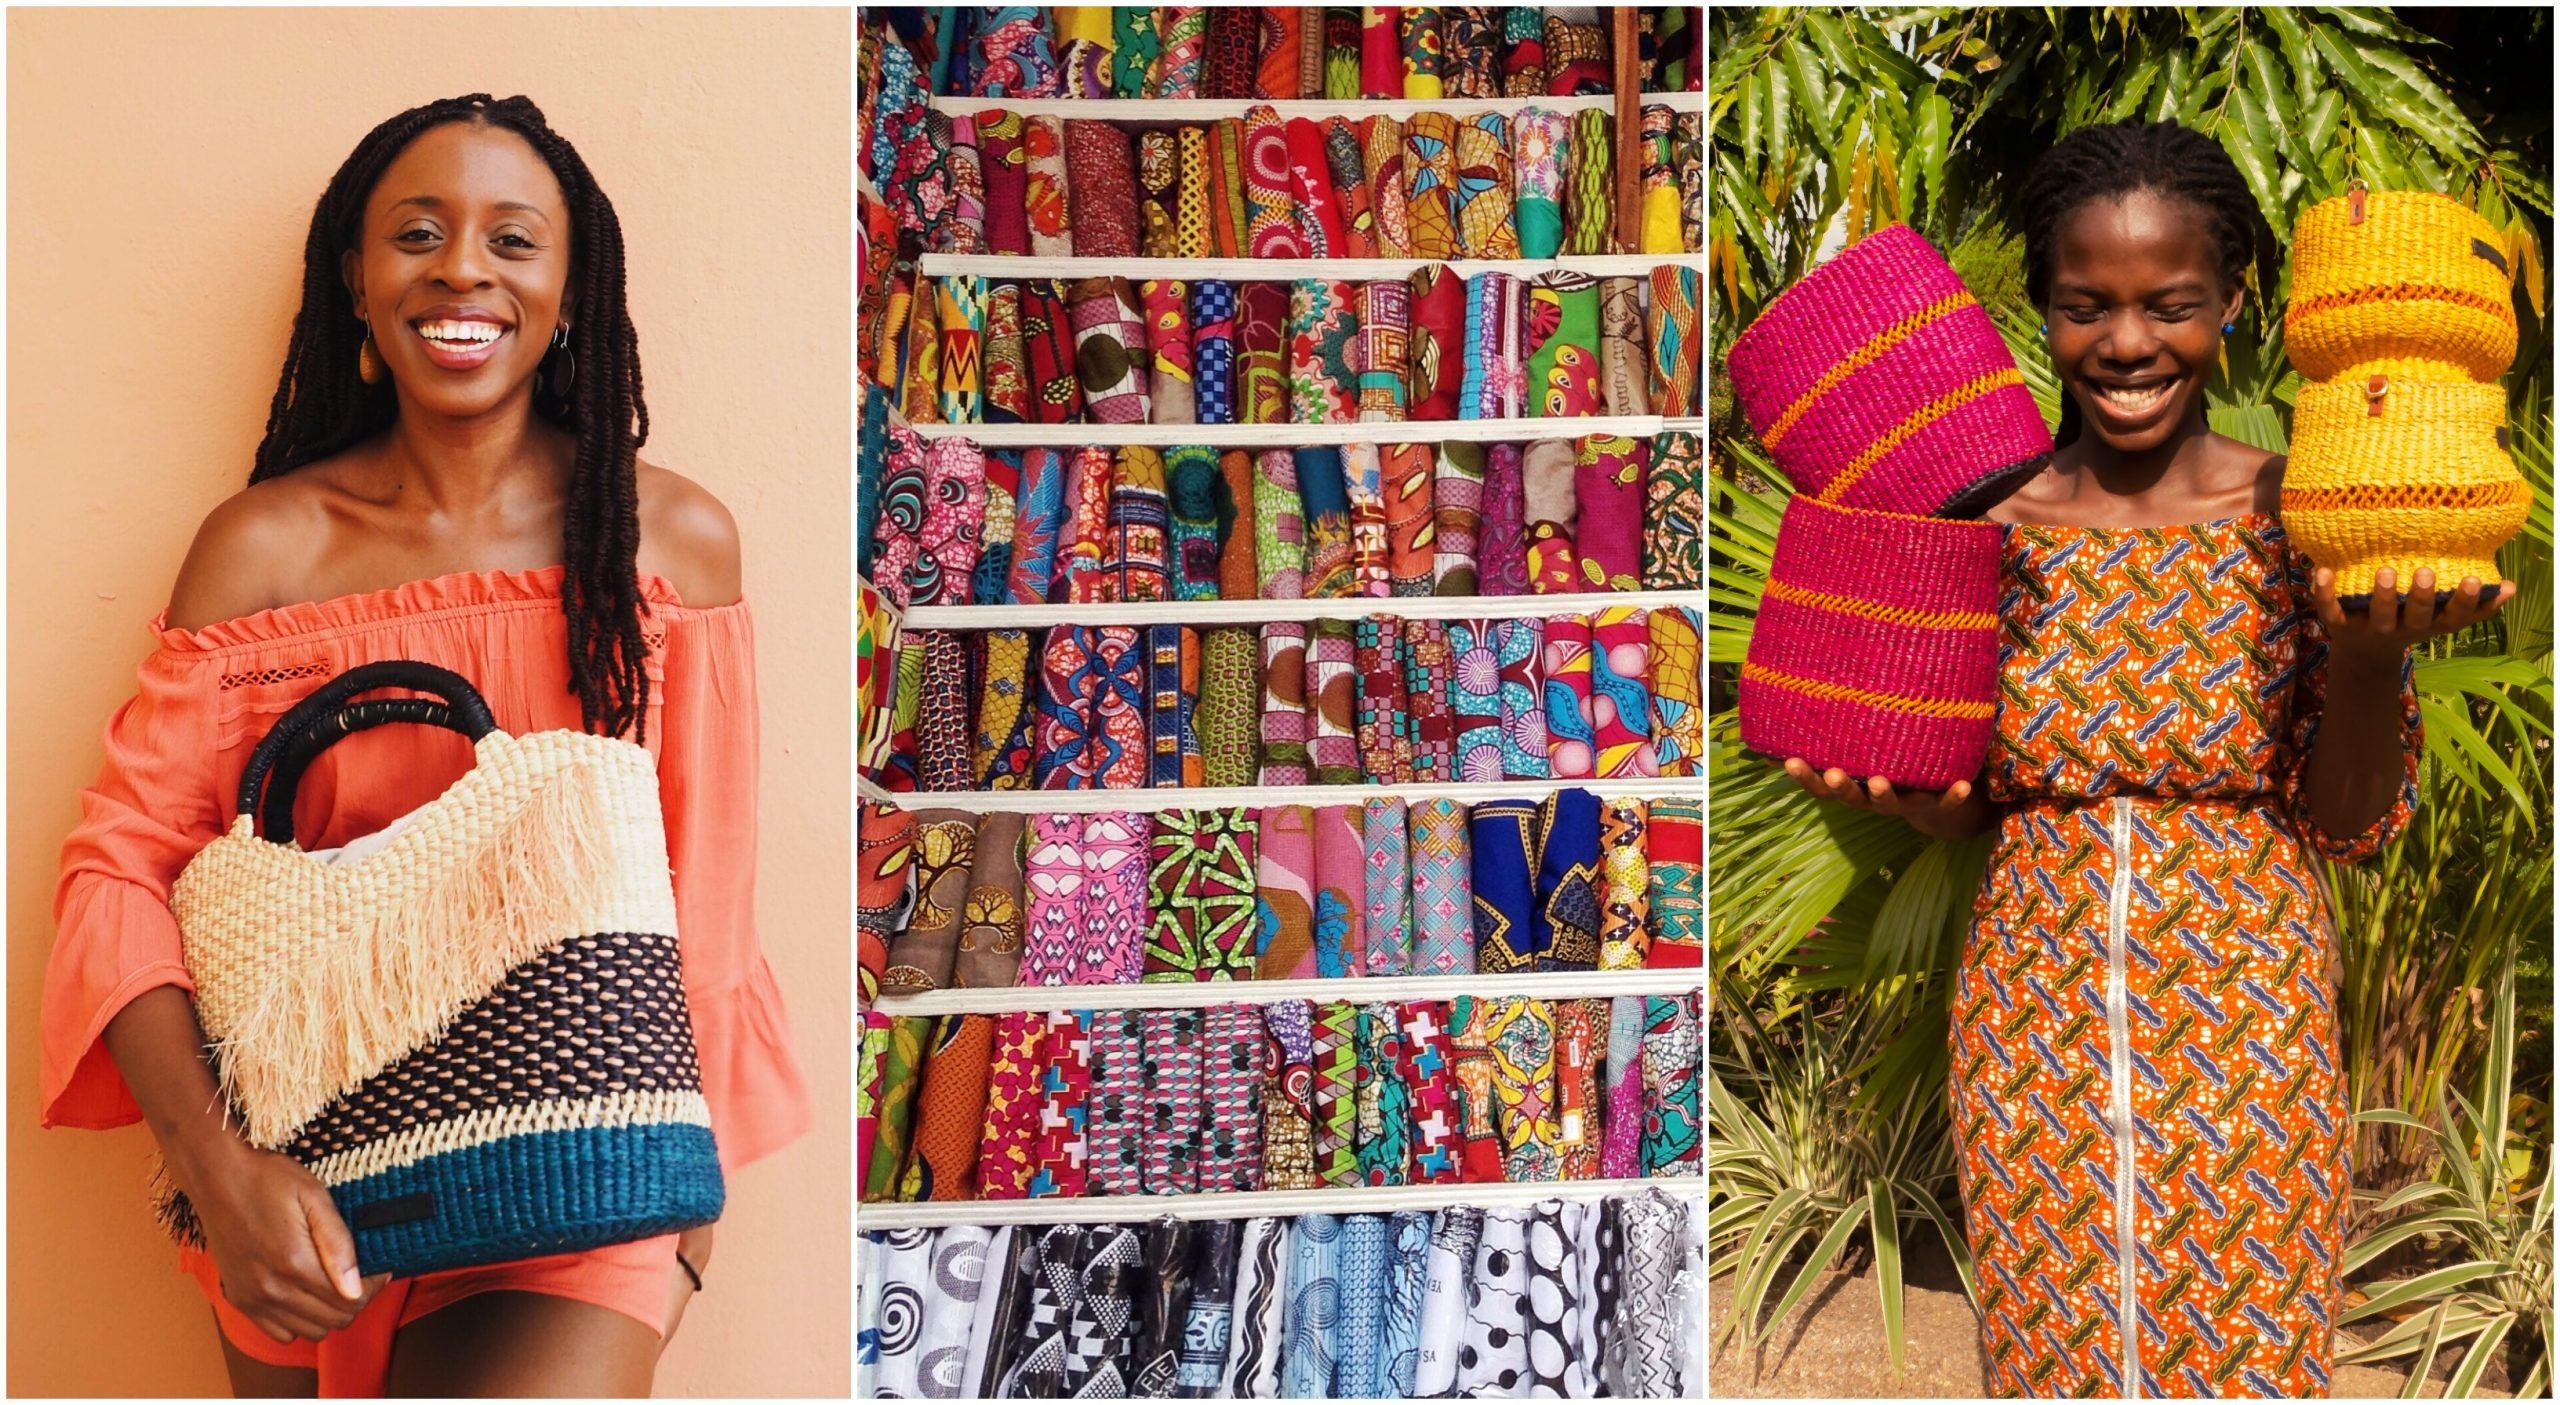 KU graduate's dream of woven bags around the world